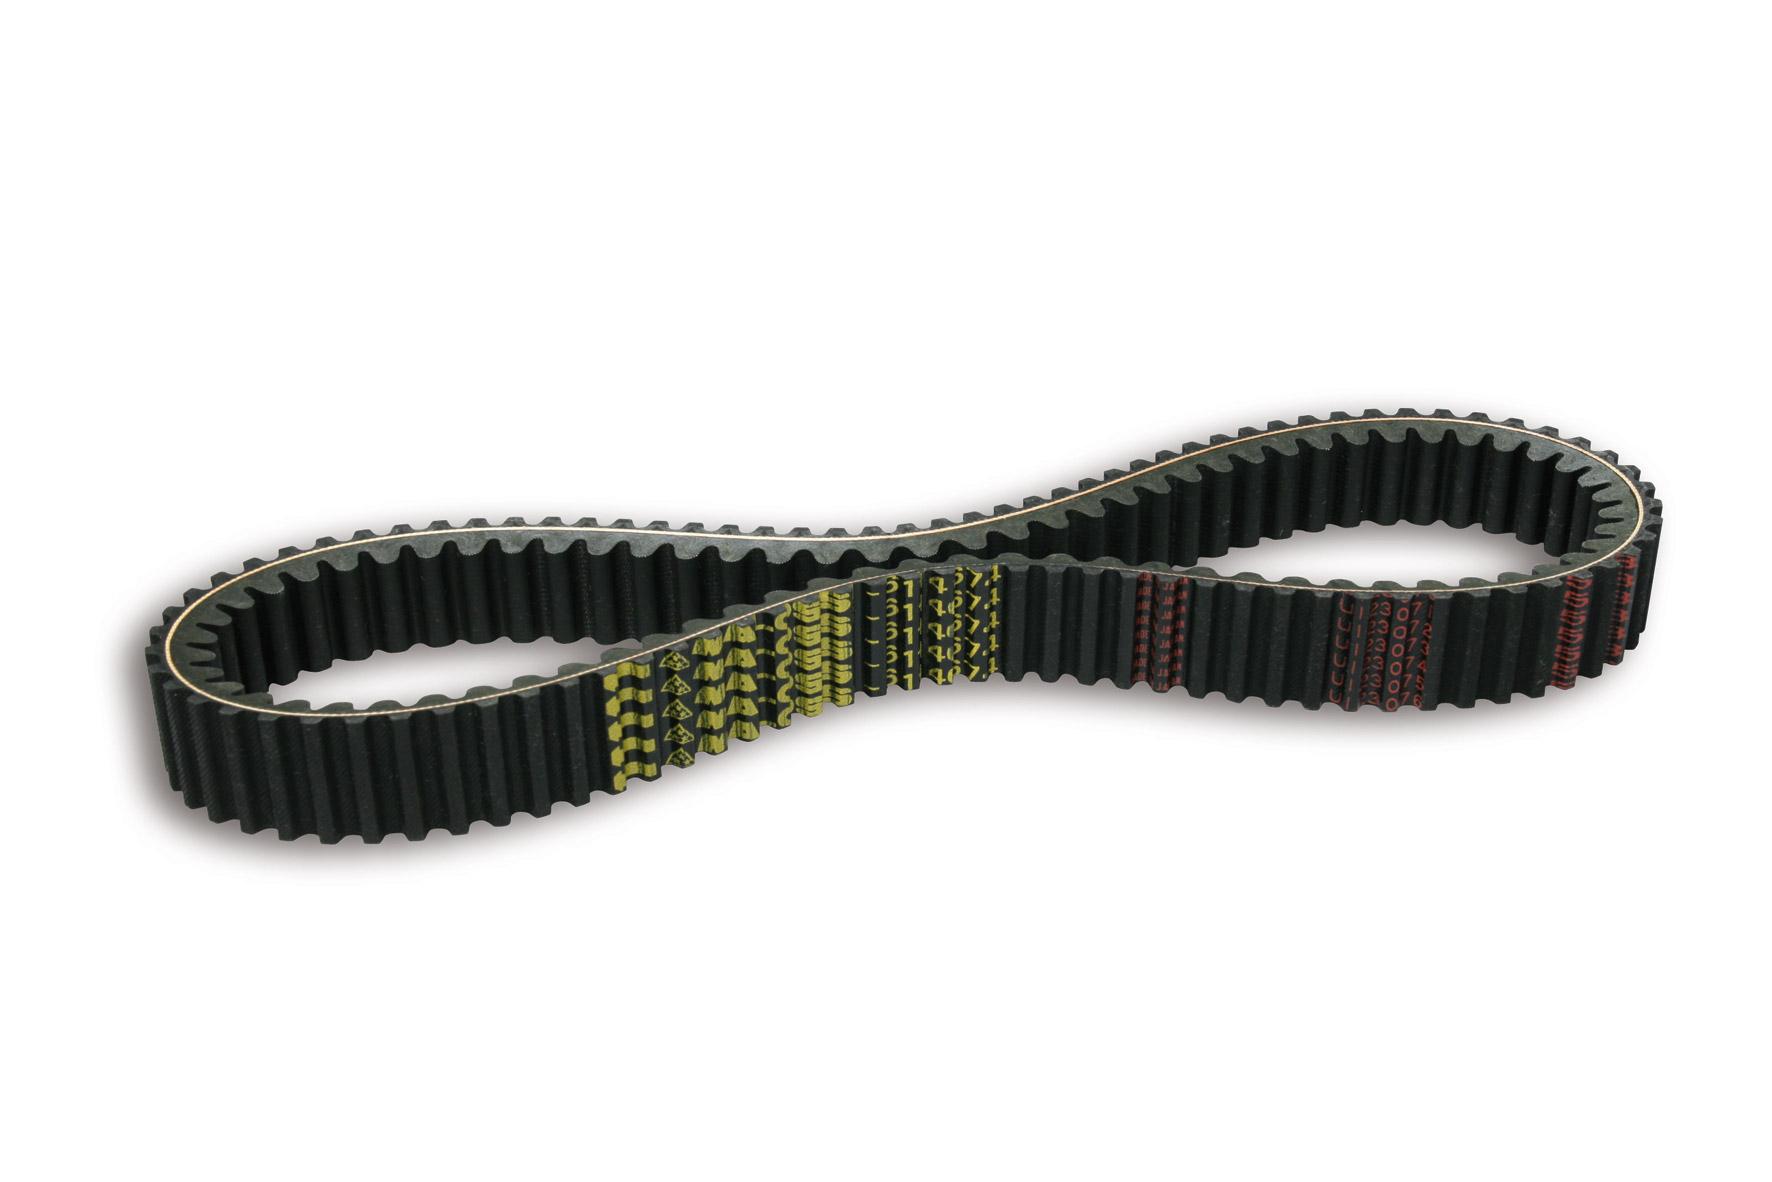 Cinghia X K belt per Yamaha T MAX 500 cc (dimensione 32,2x14,9x892 mm - angolo 28°)